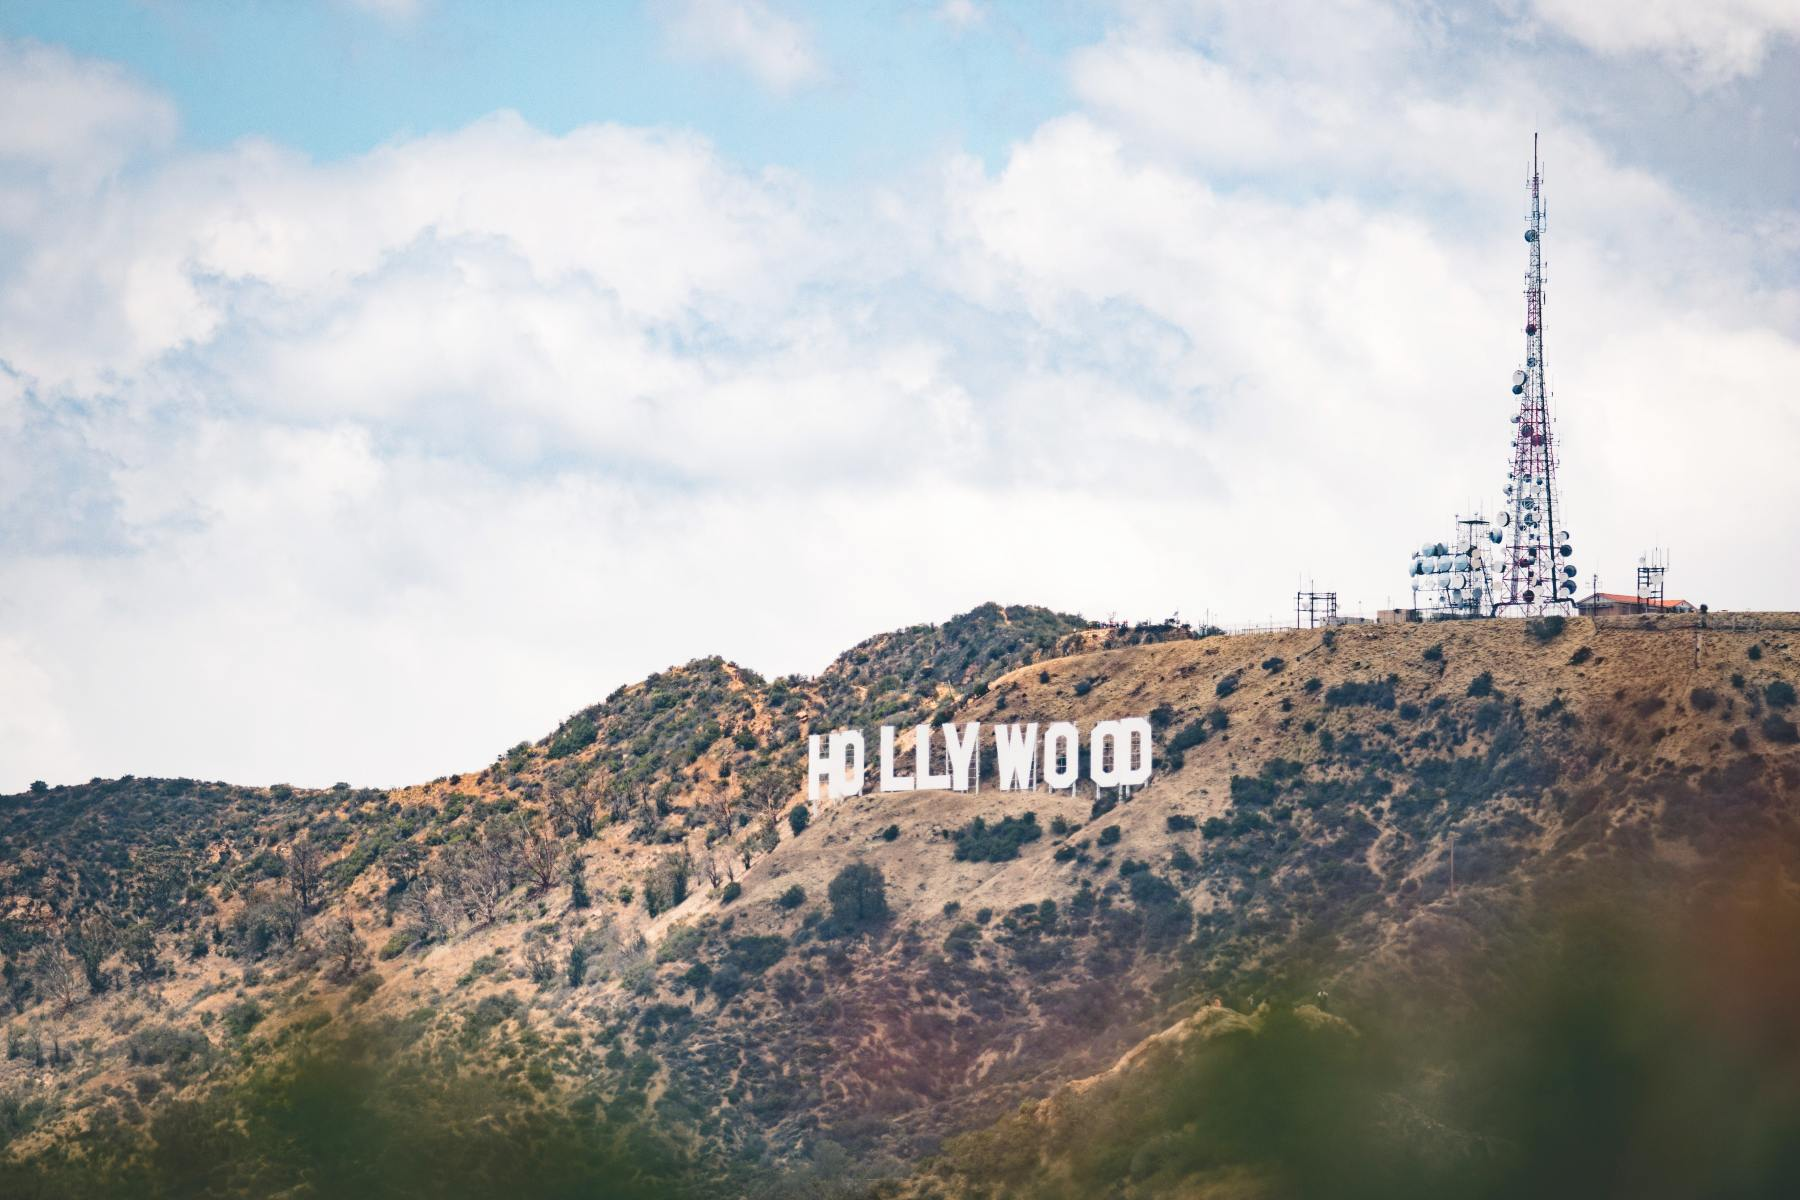 griffith park hollywood sign